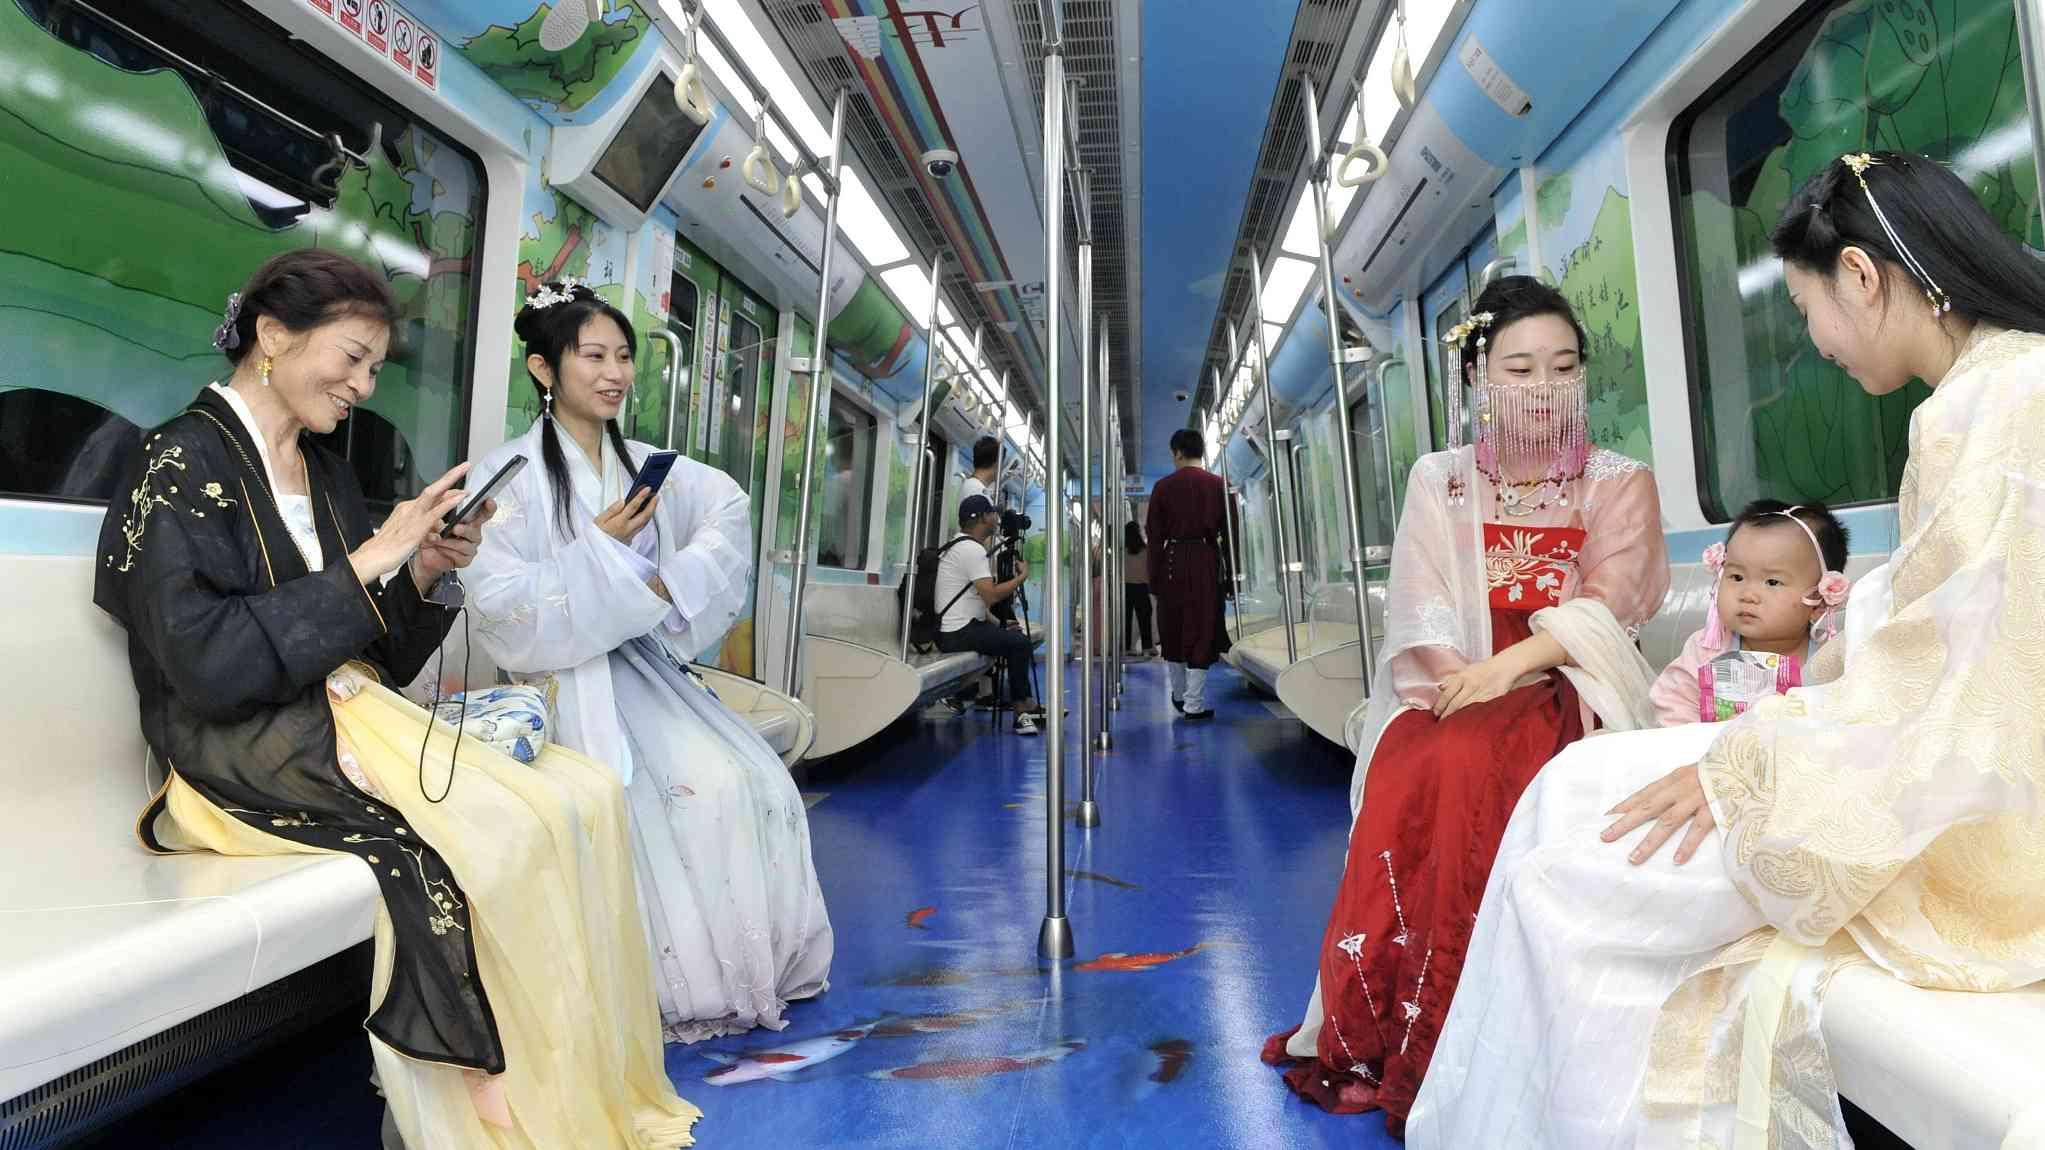 Xi'an's subway brings the Tang Dynasty back to life